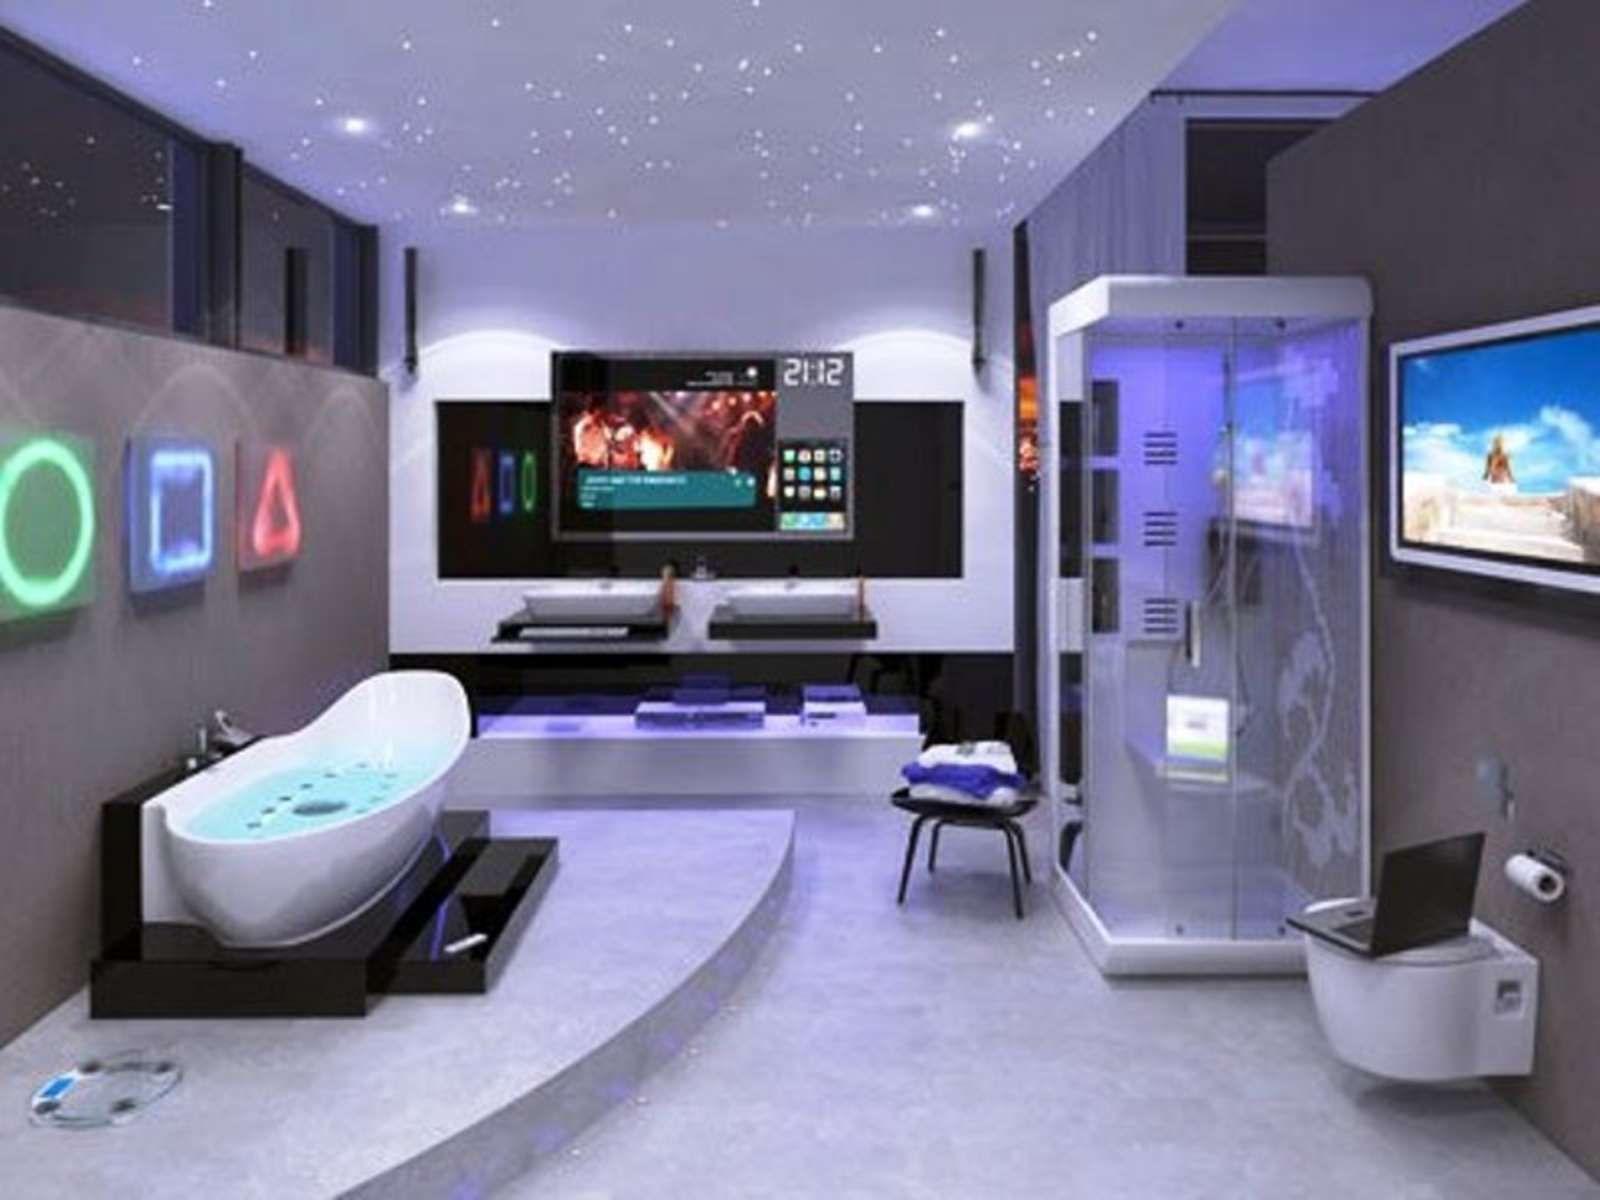 new futuristic bathroom sink | future home | pinterest | modern